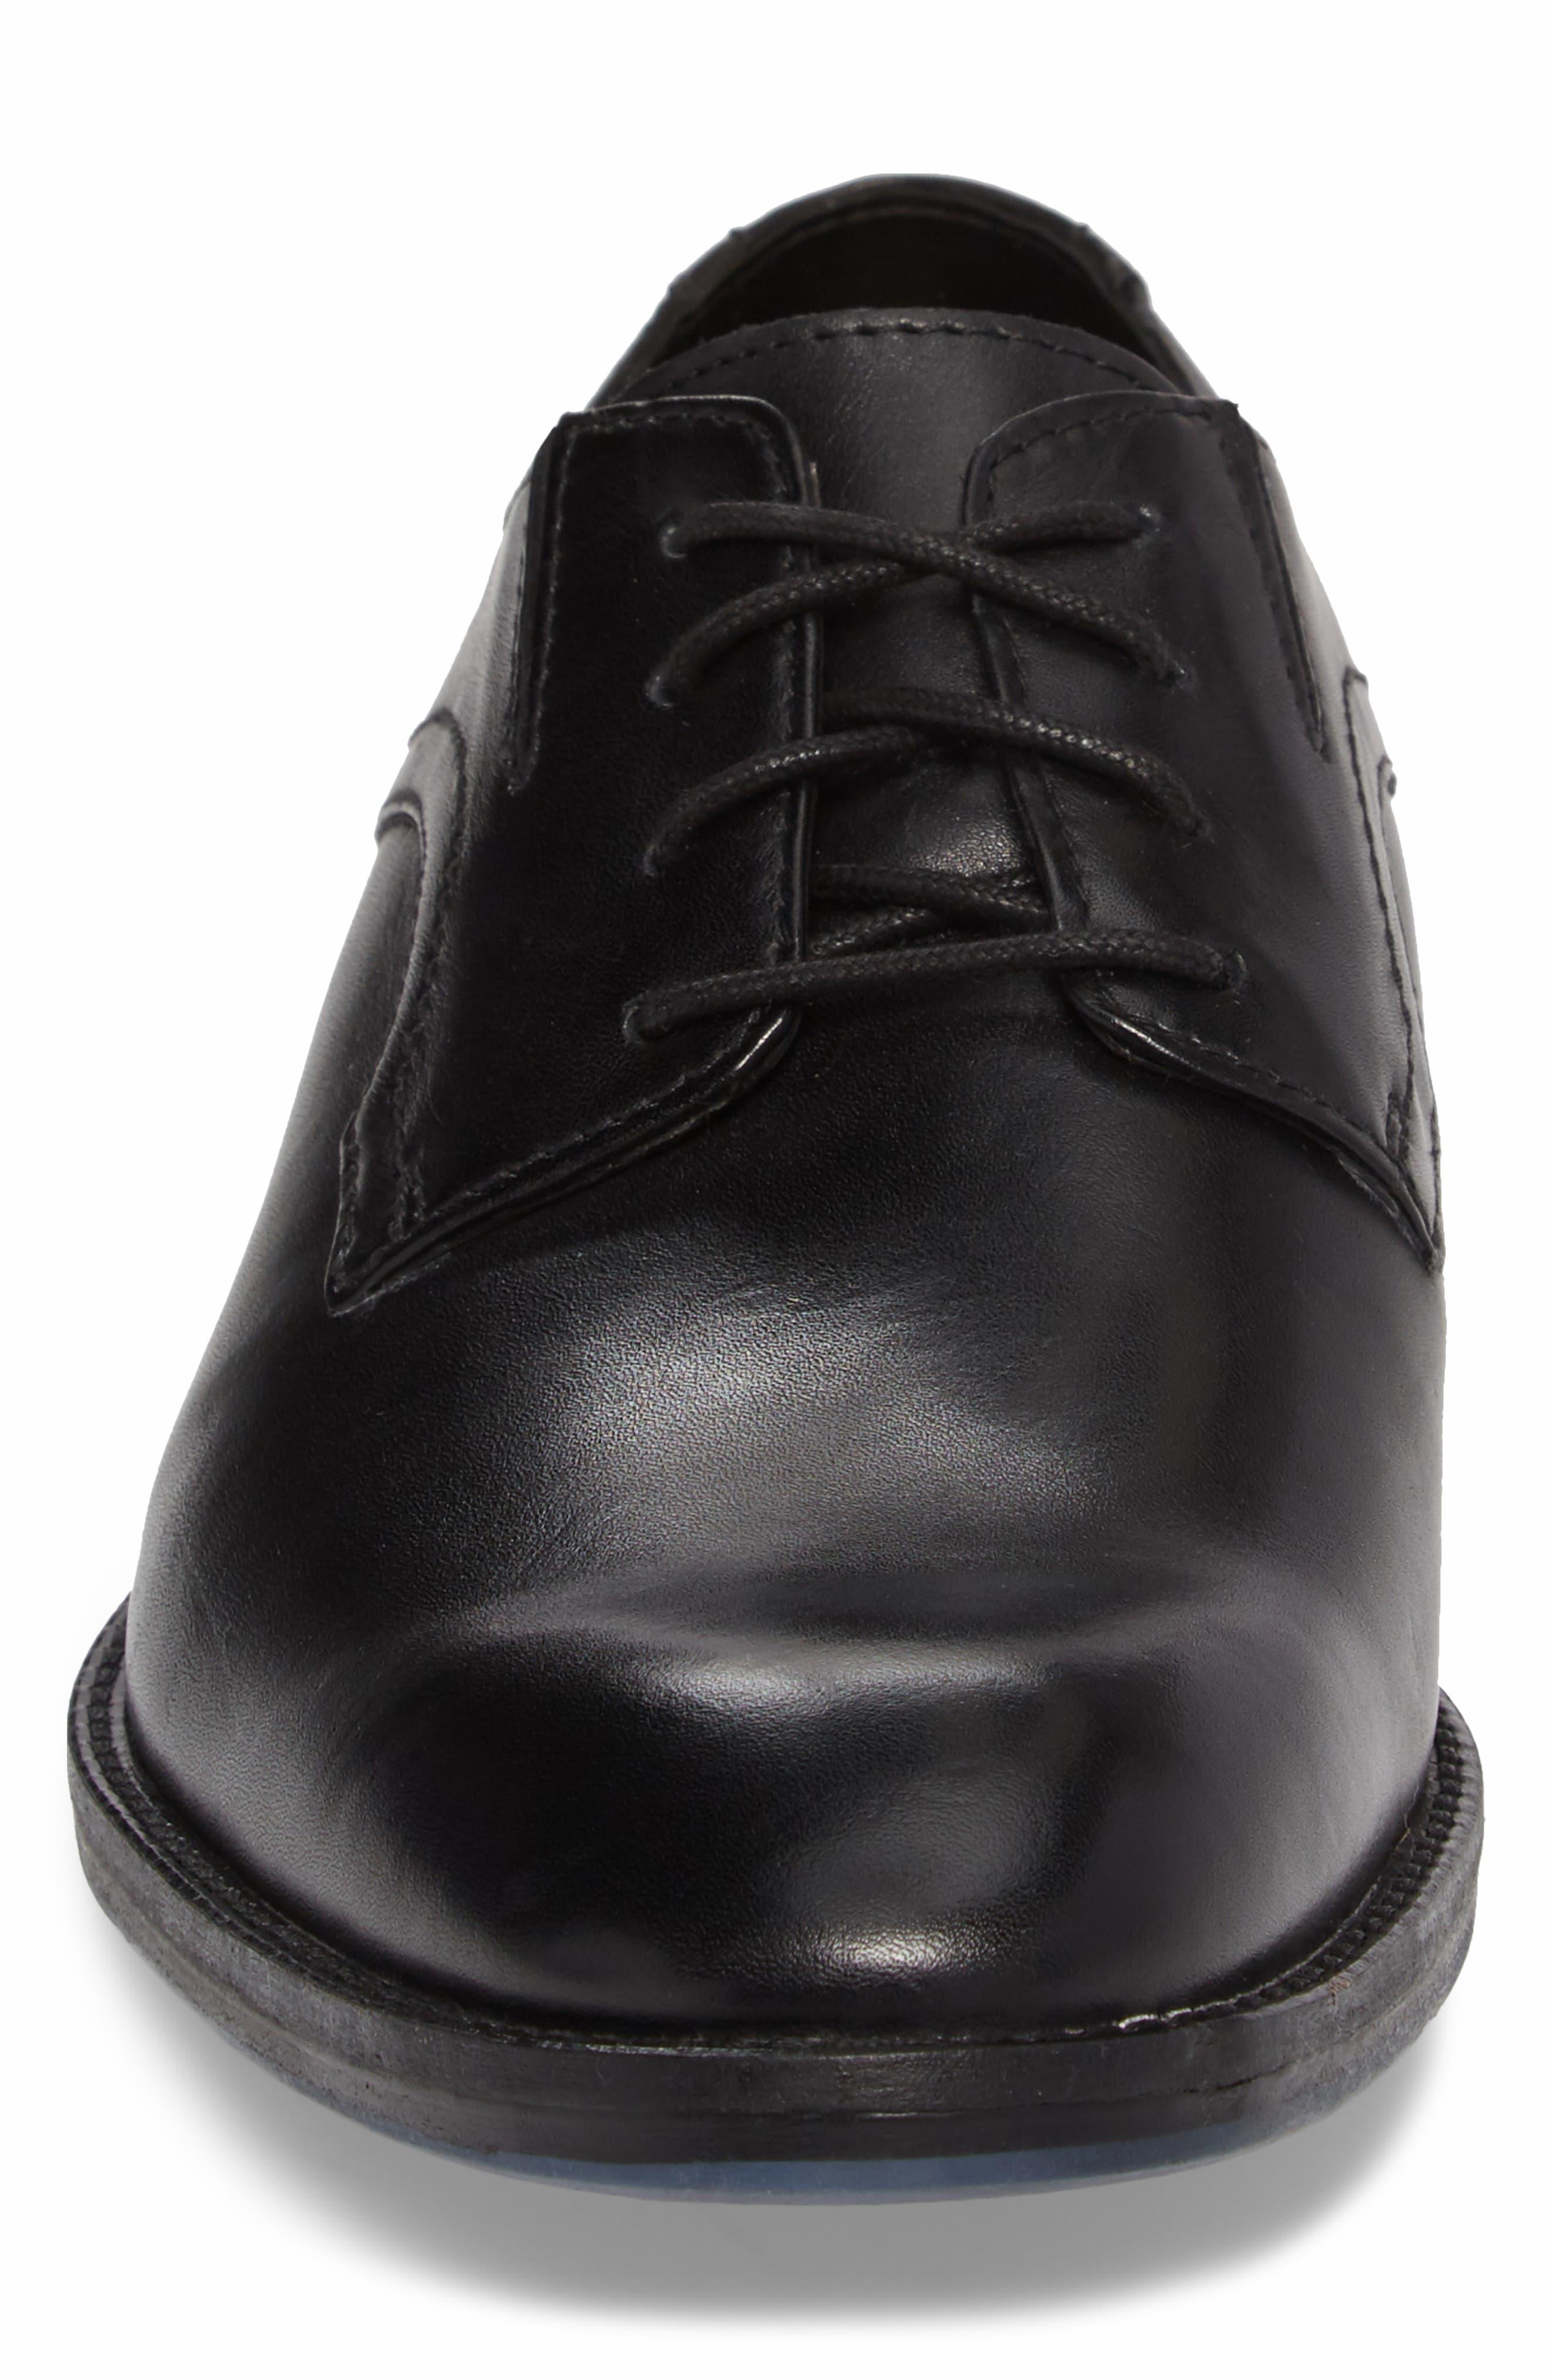 Clarks<sup>®</sup> Prangley Walk Plain Toe Derby,                             Alternate thumbnail 4, color,                             003